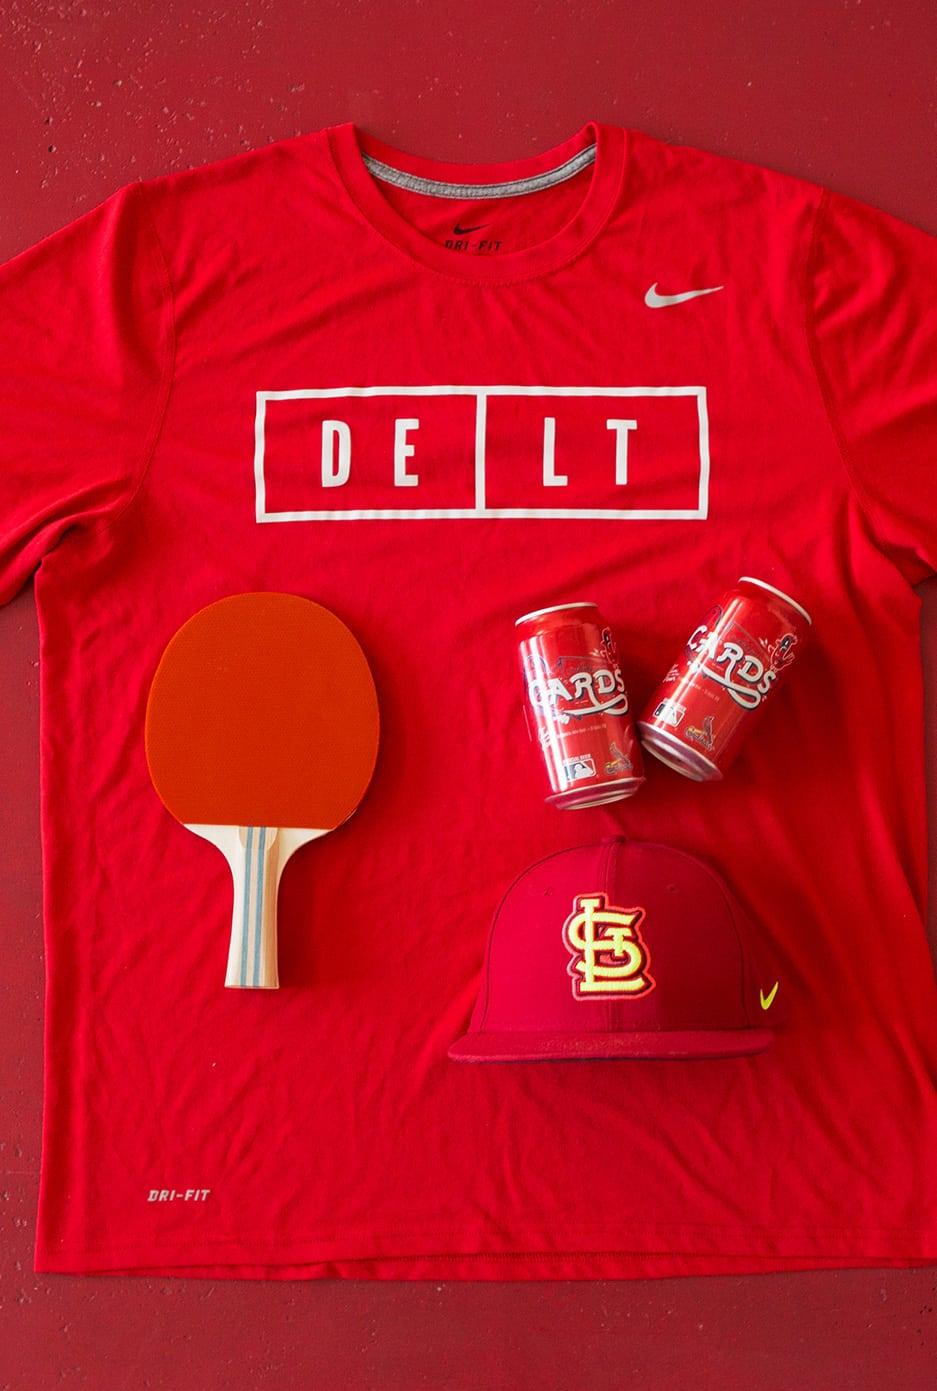 St. Louis branding agency